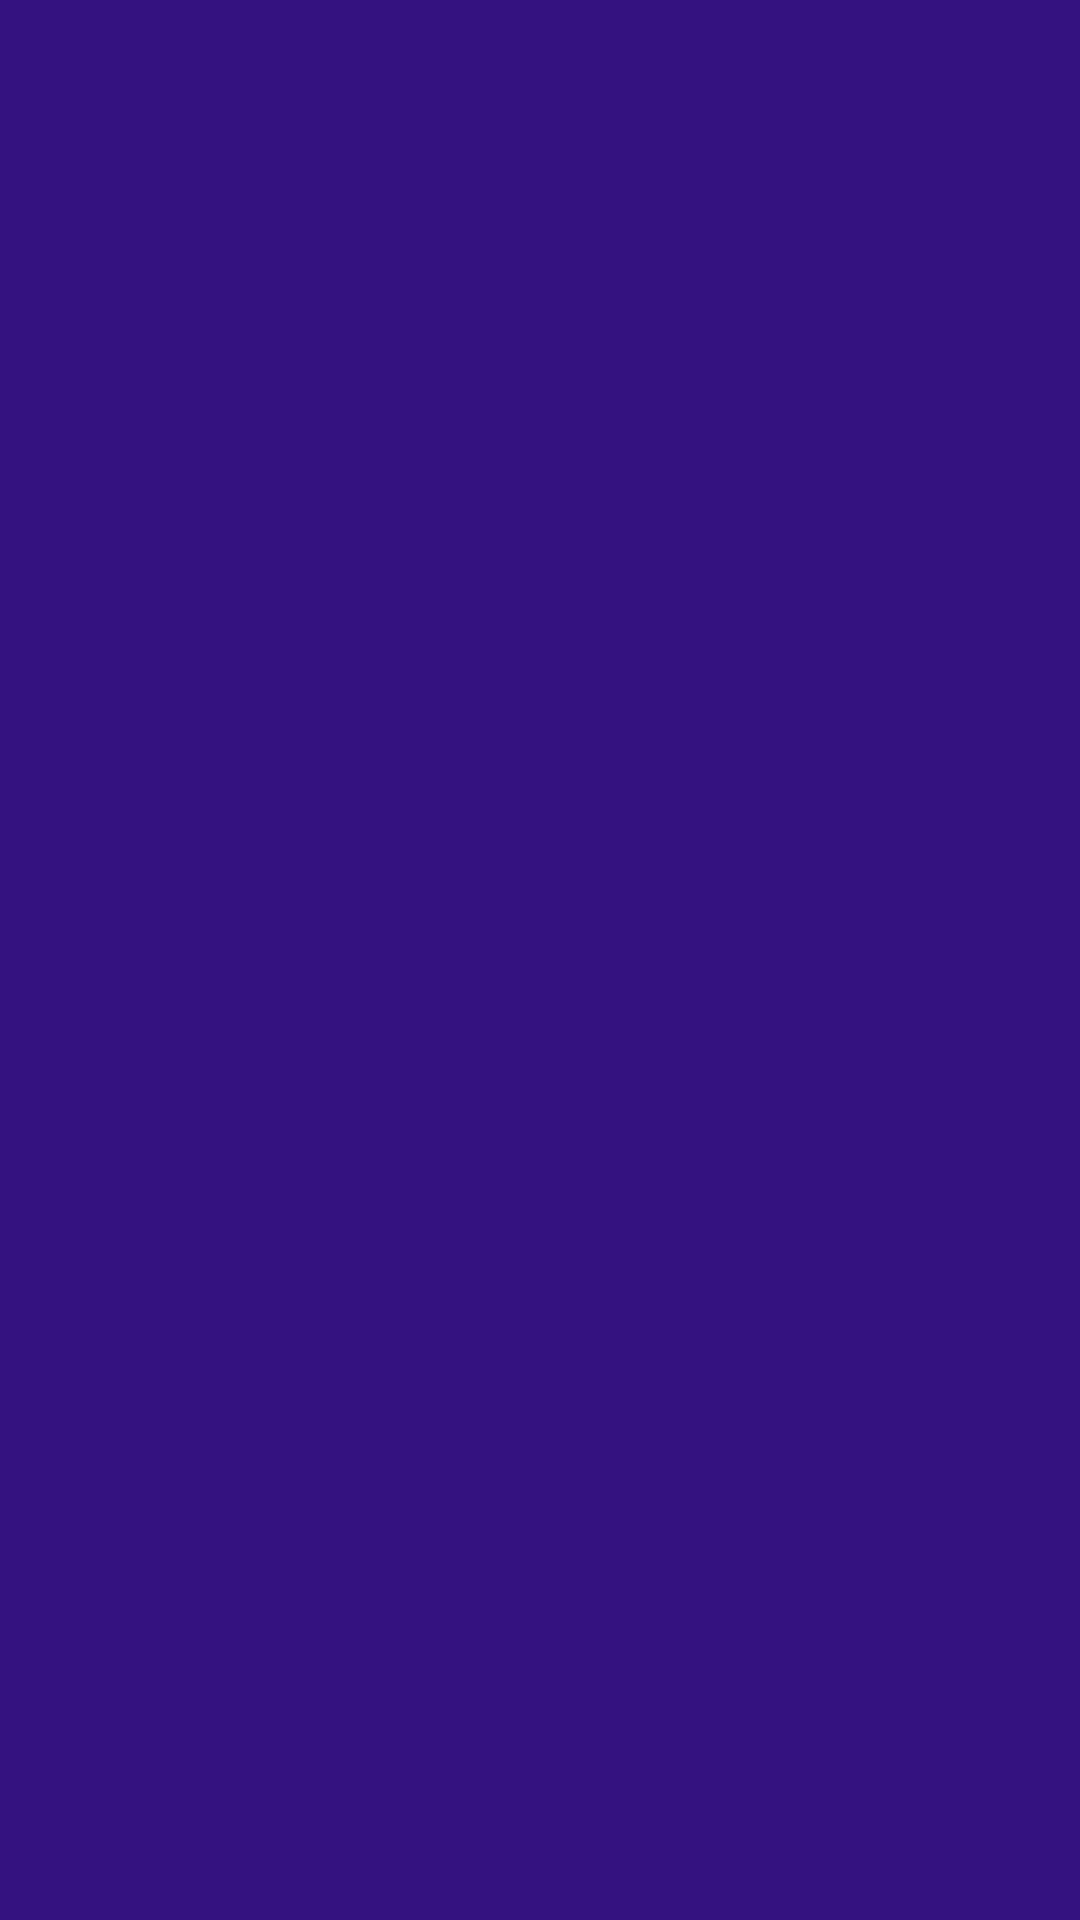 1080x1920 Persian Indigo Solid Color Background